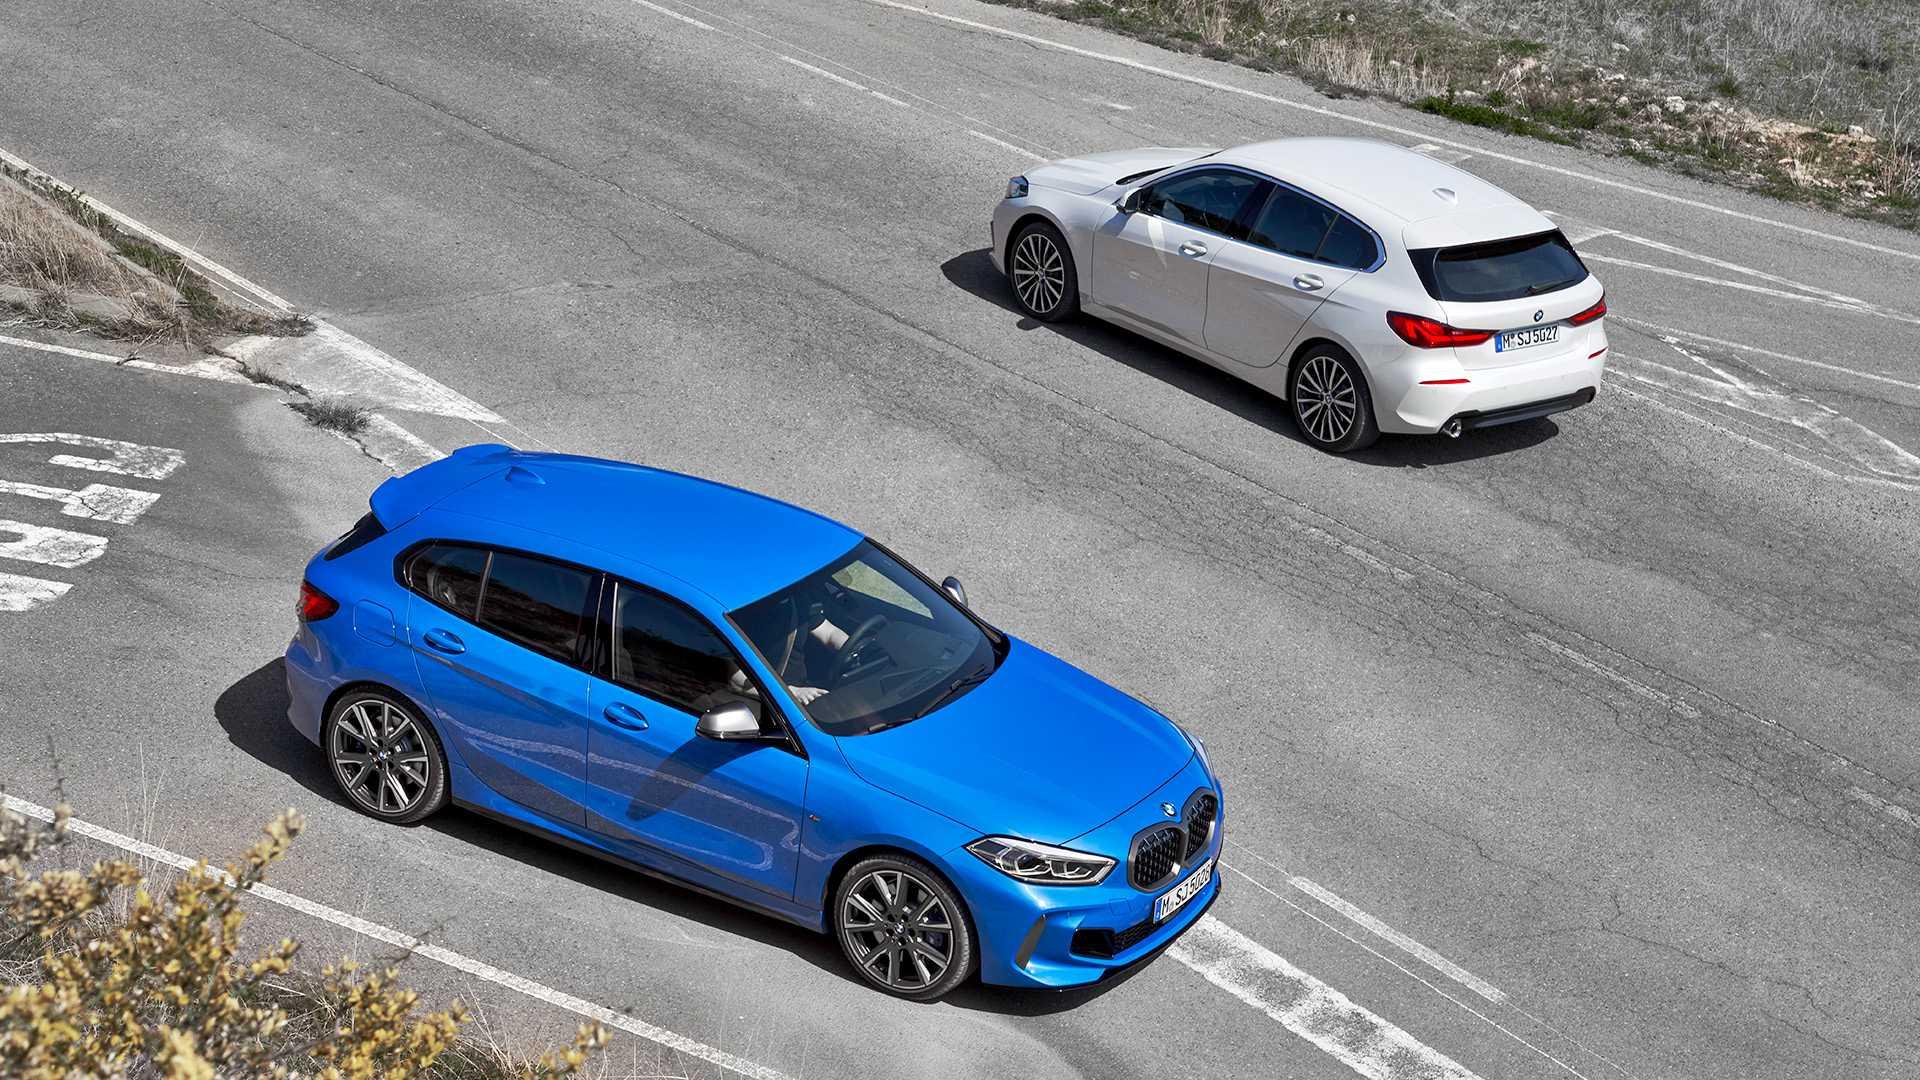 Bmw M8 Price >> Photo Comparison: 2020 BMW 1 Series vs. 2017 BMW 1 Series ...